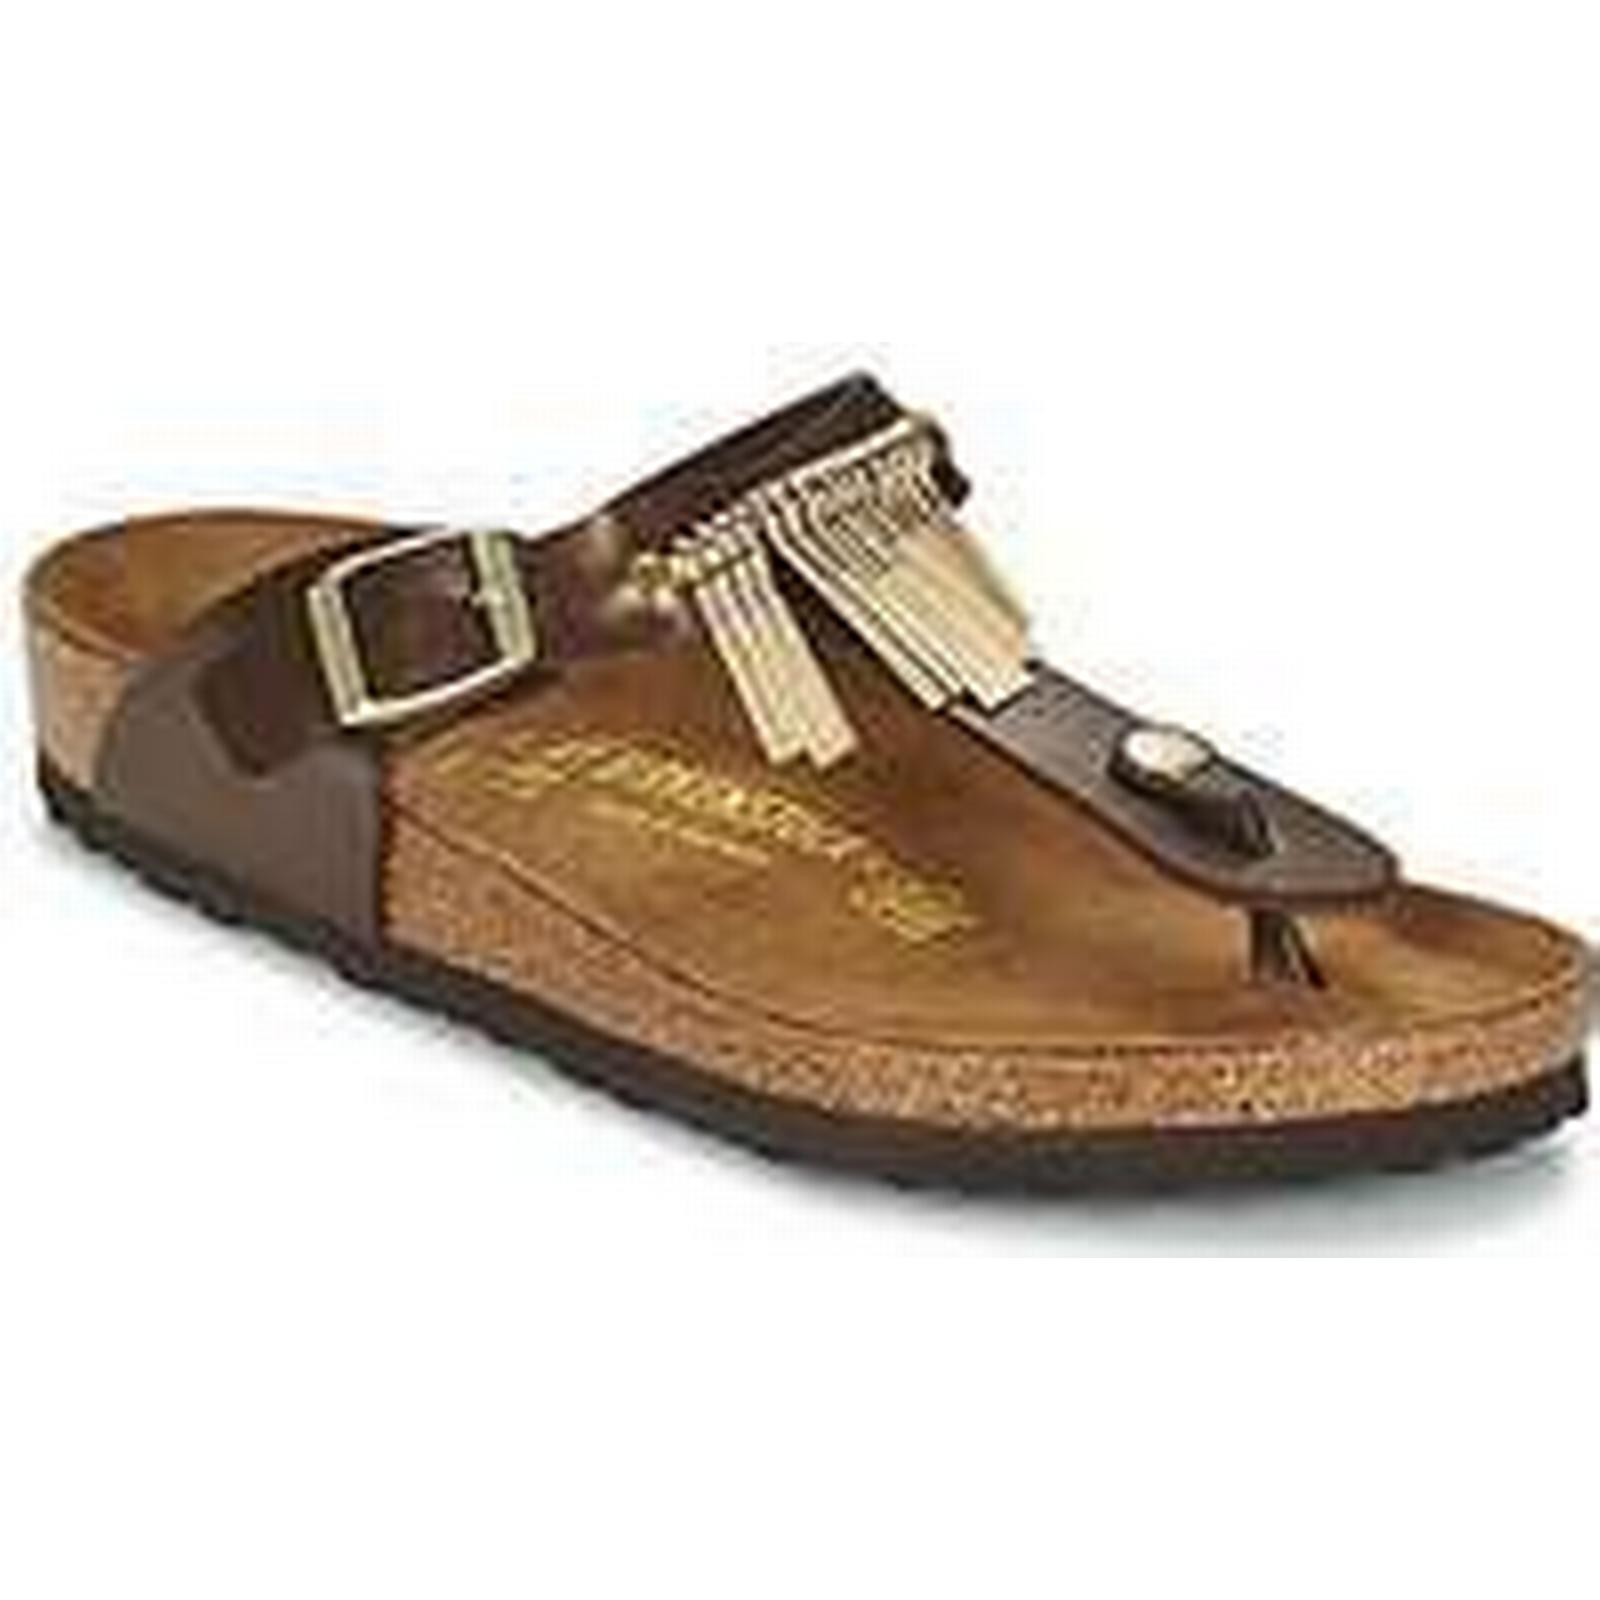 395ab90e63 Spartoo.co.uk Birkenstock GIZEH FRINGE women's Flip Flip Flip flops /  Sandals ...